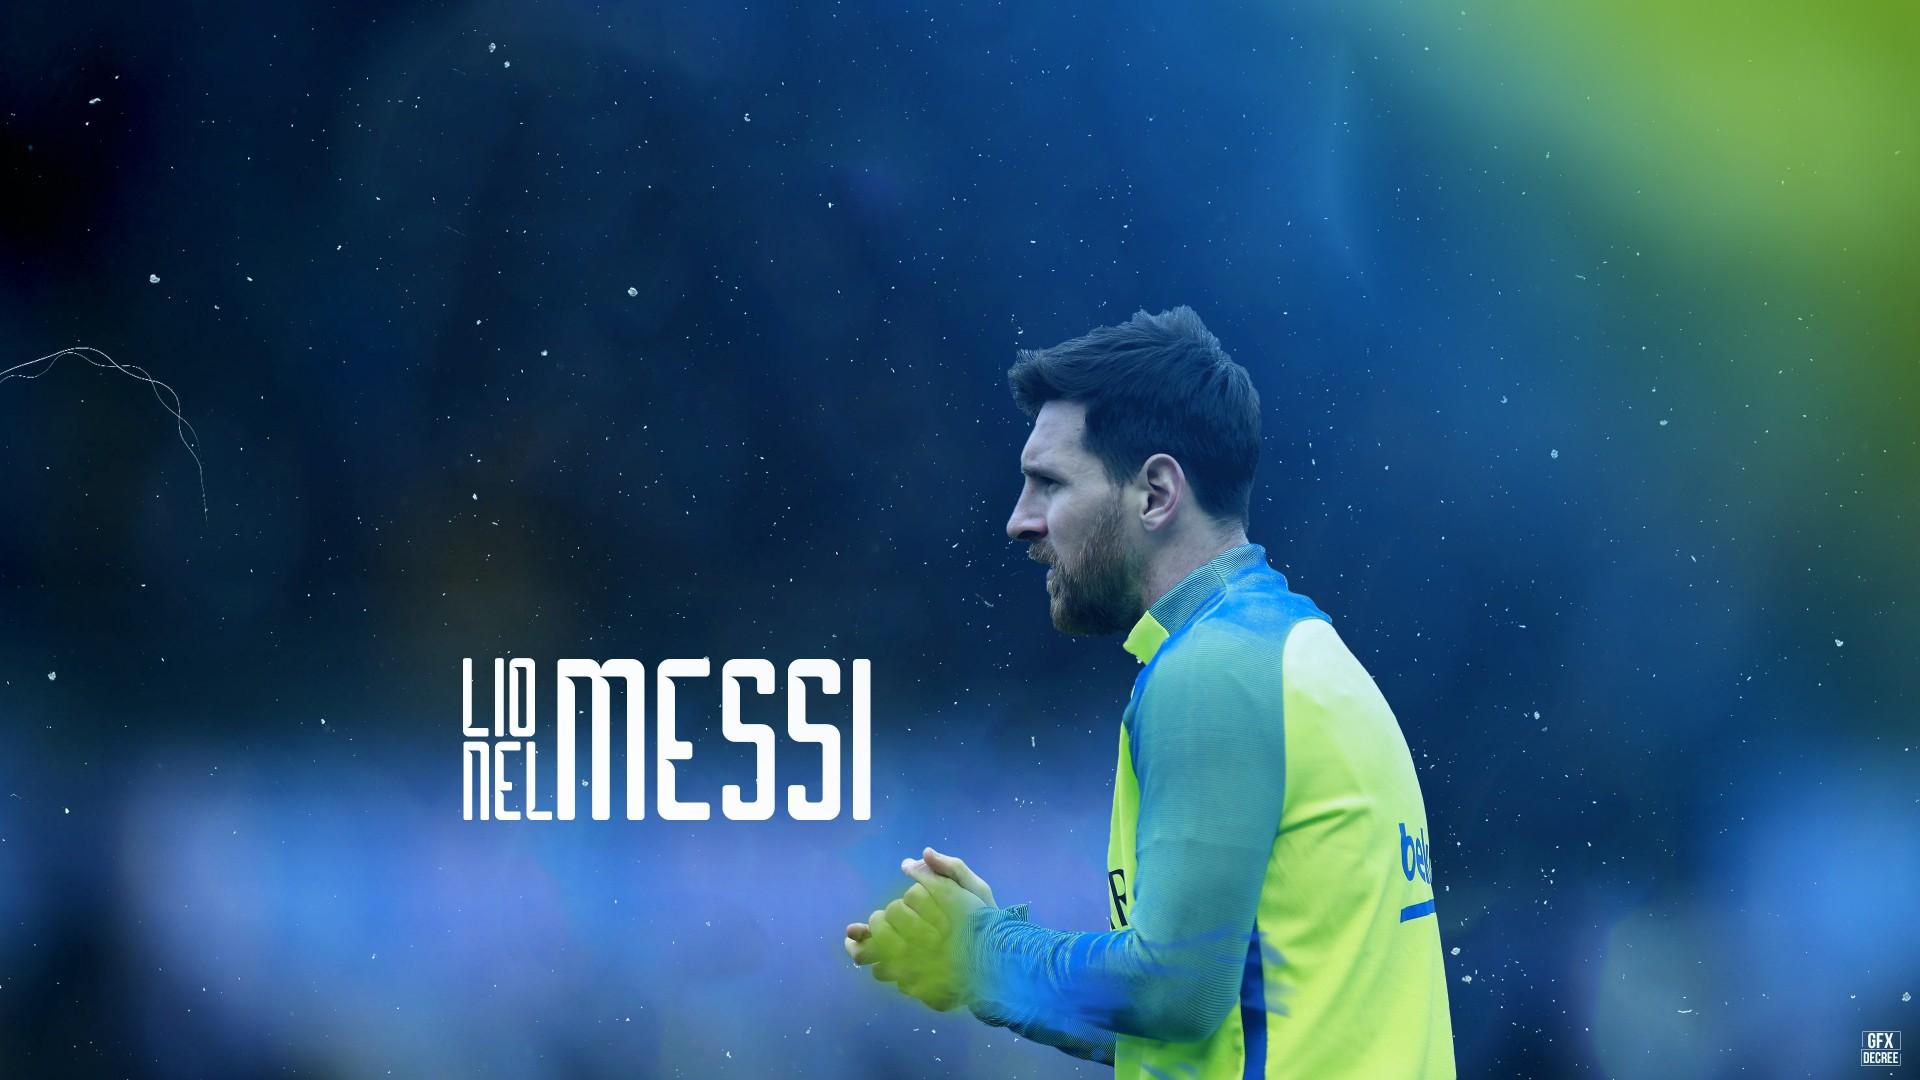 Hd Wallpaper Wallpapers Hd Lionel Messi